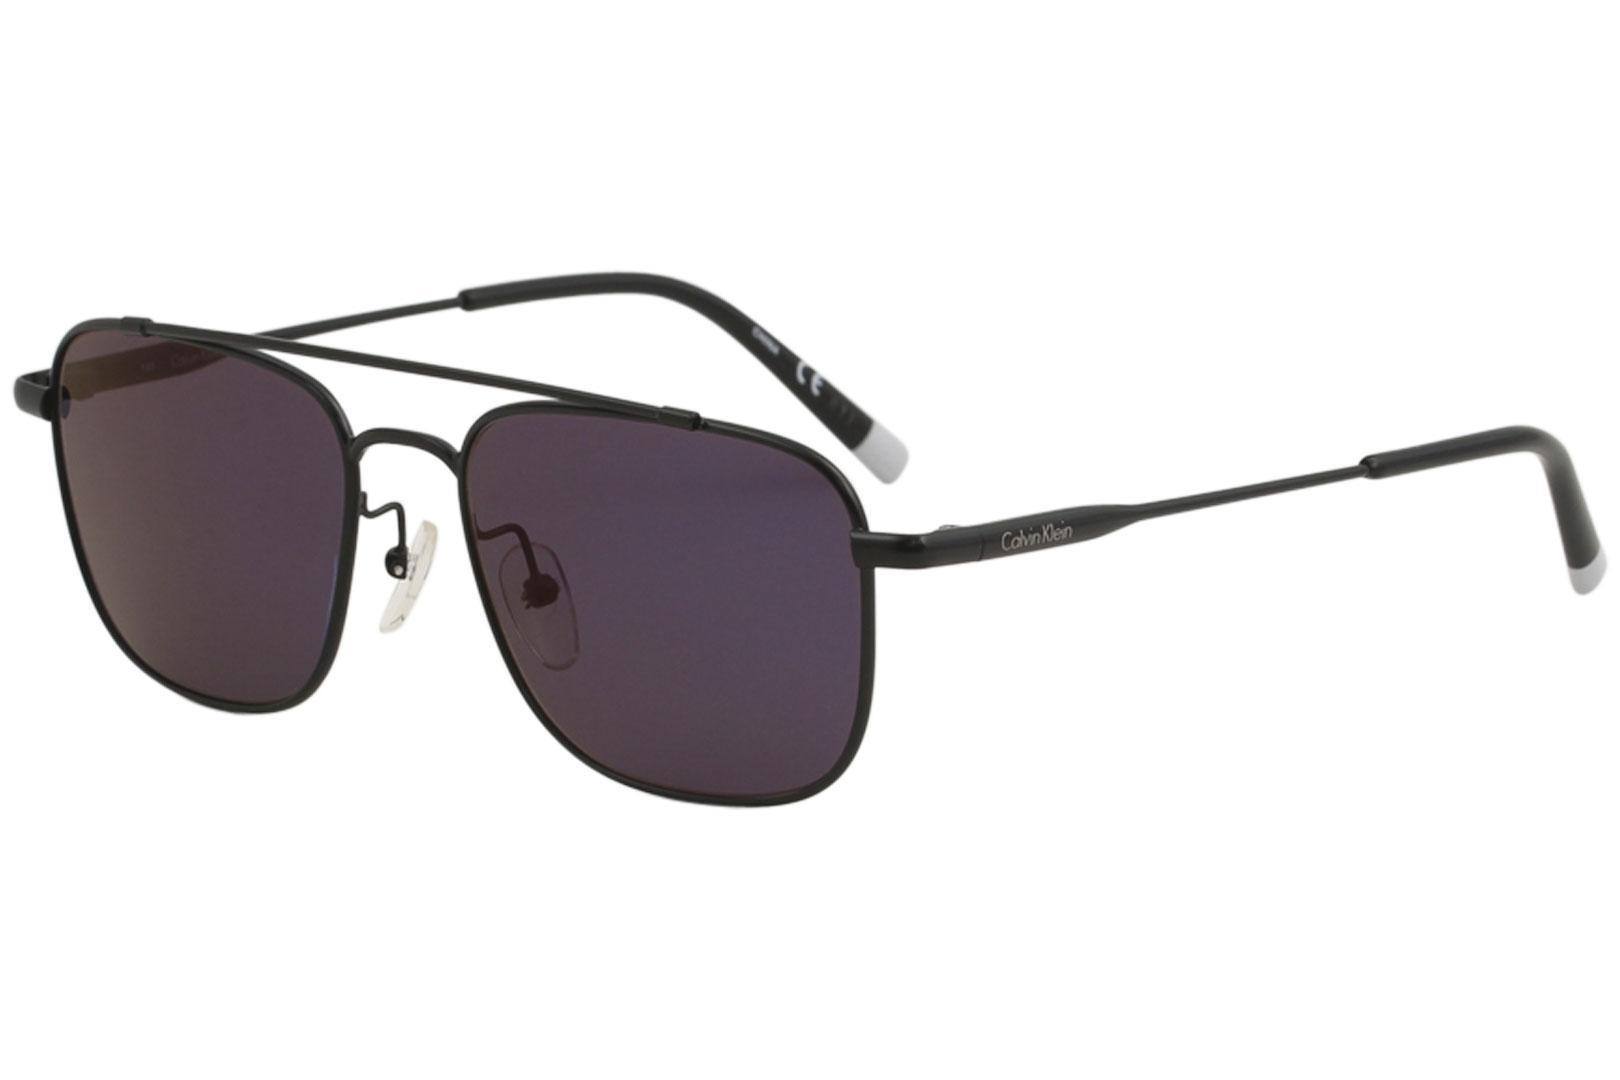 74f4321bd4 Calvin Klein Women s CK2150S CK 2150 S Fashion Pilot Sunglasses